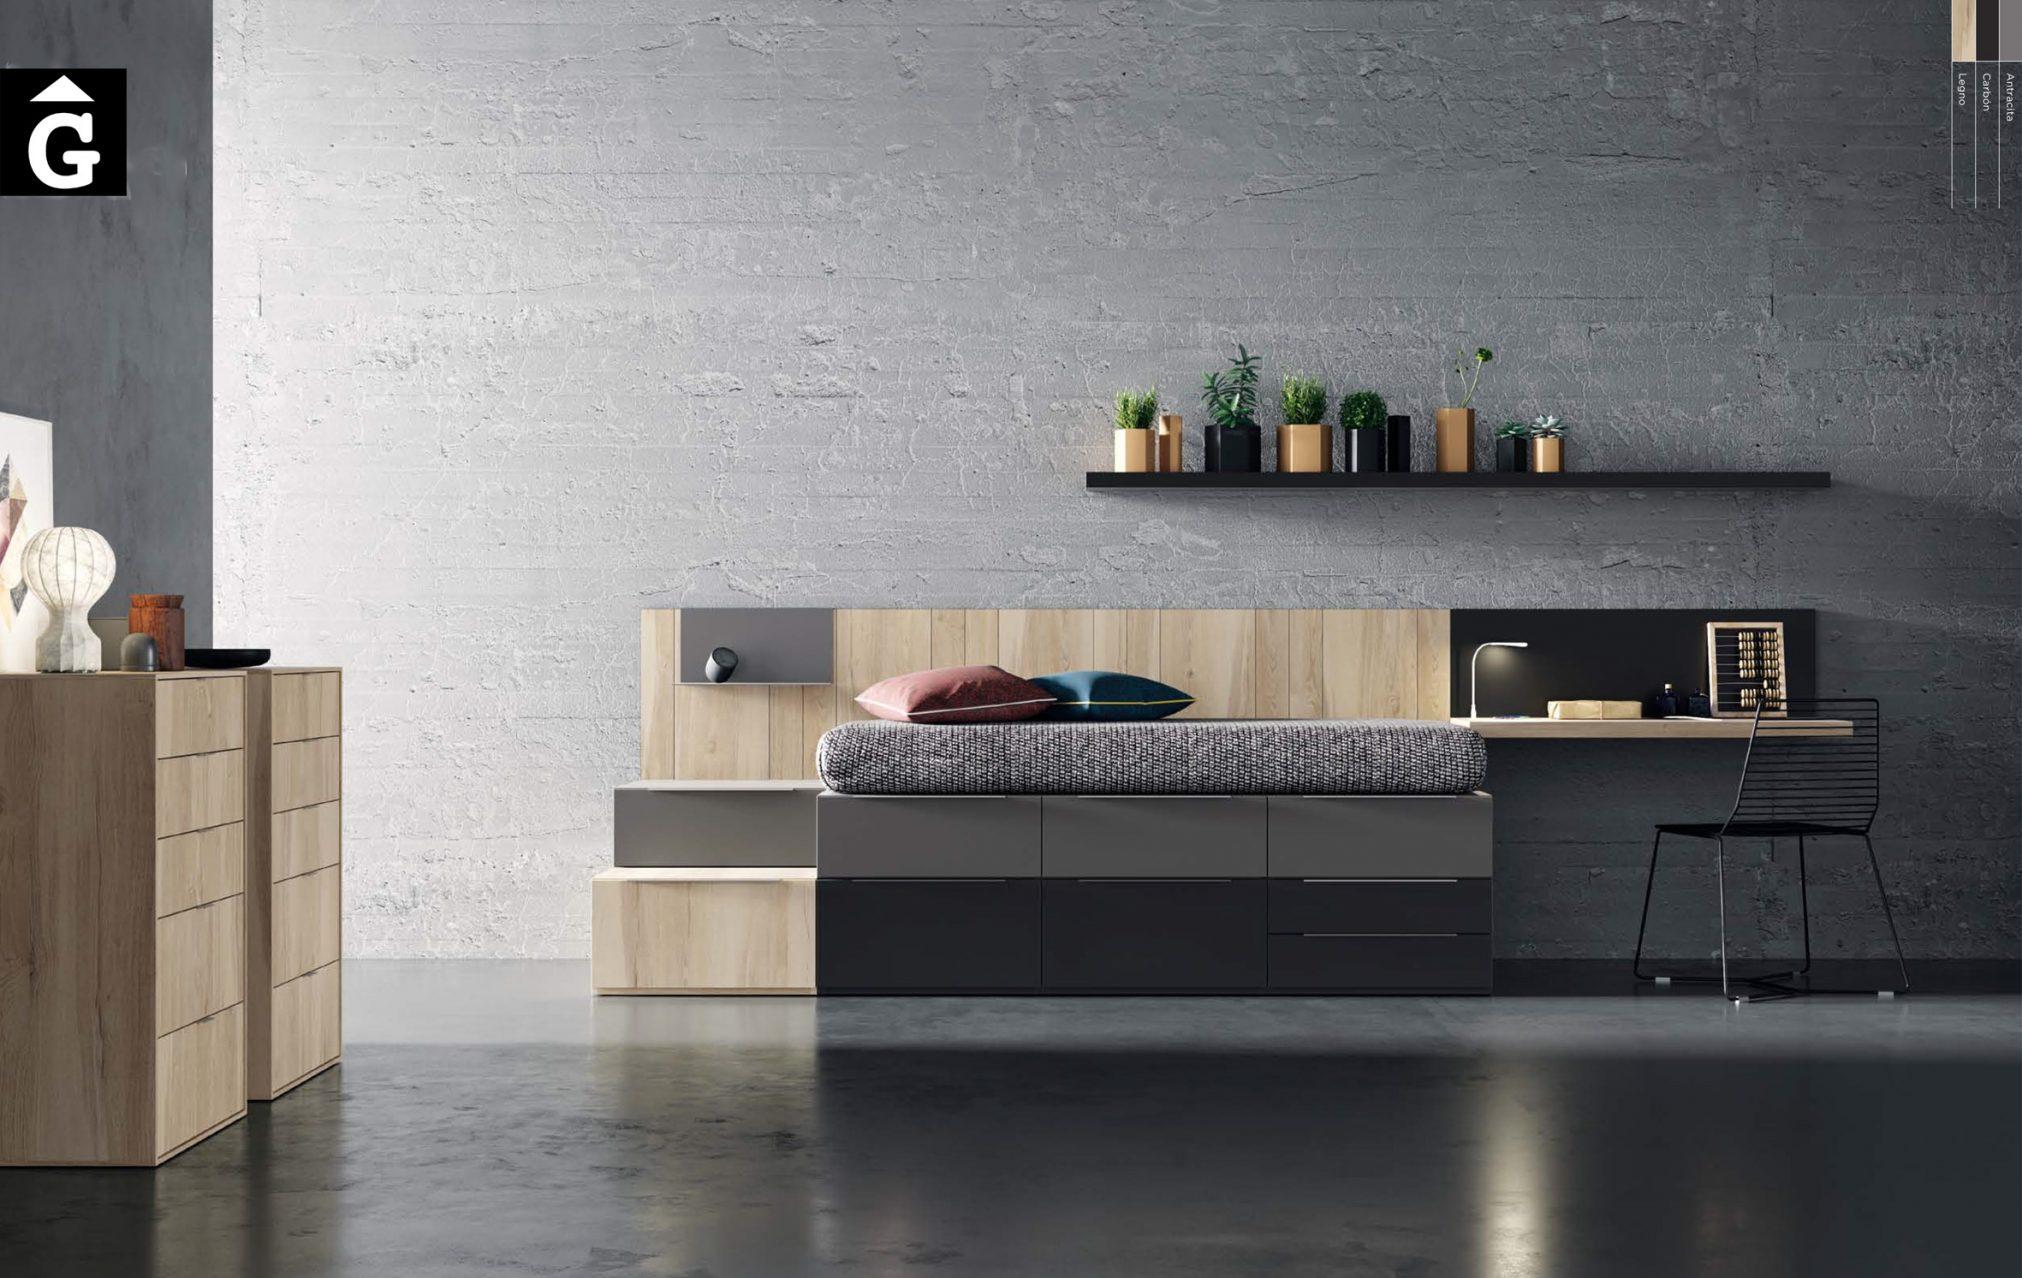 Llit calaixos QBn 8 22 Llit compacta calaixos QB NEXT Tegar by nobles GIFREU Girona modern minim elegant atemporal